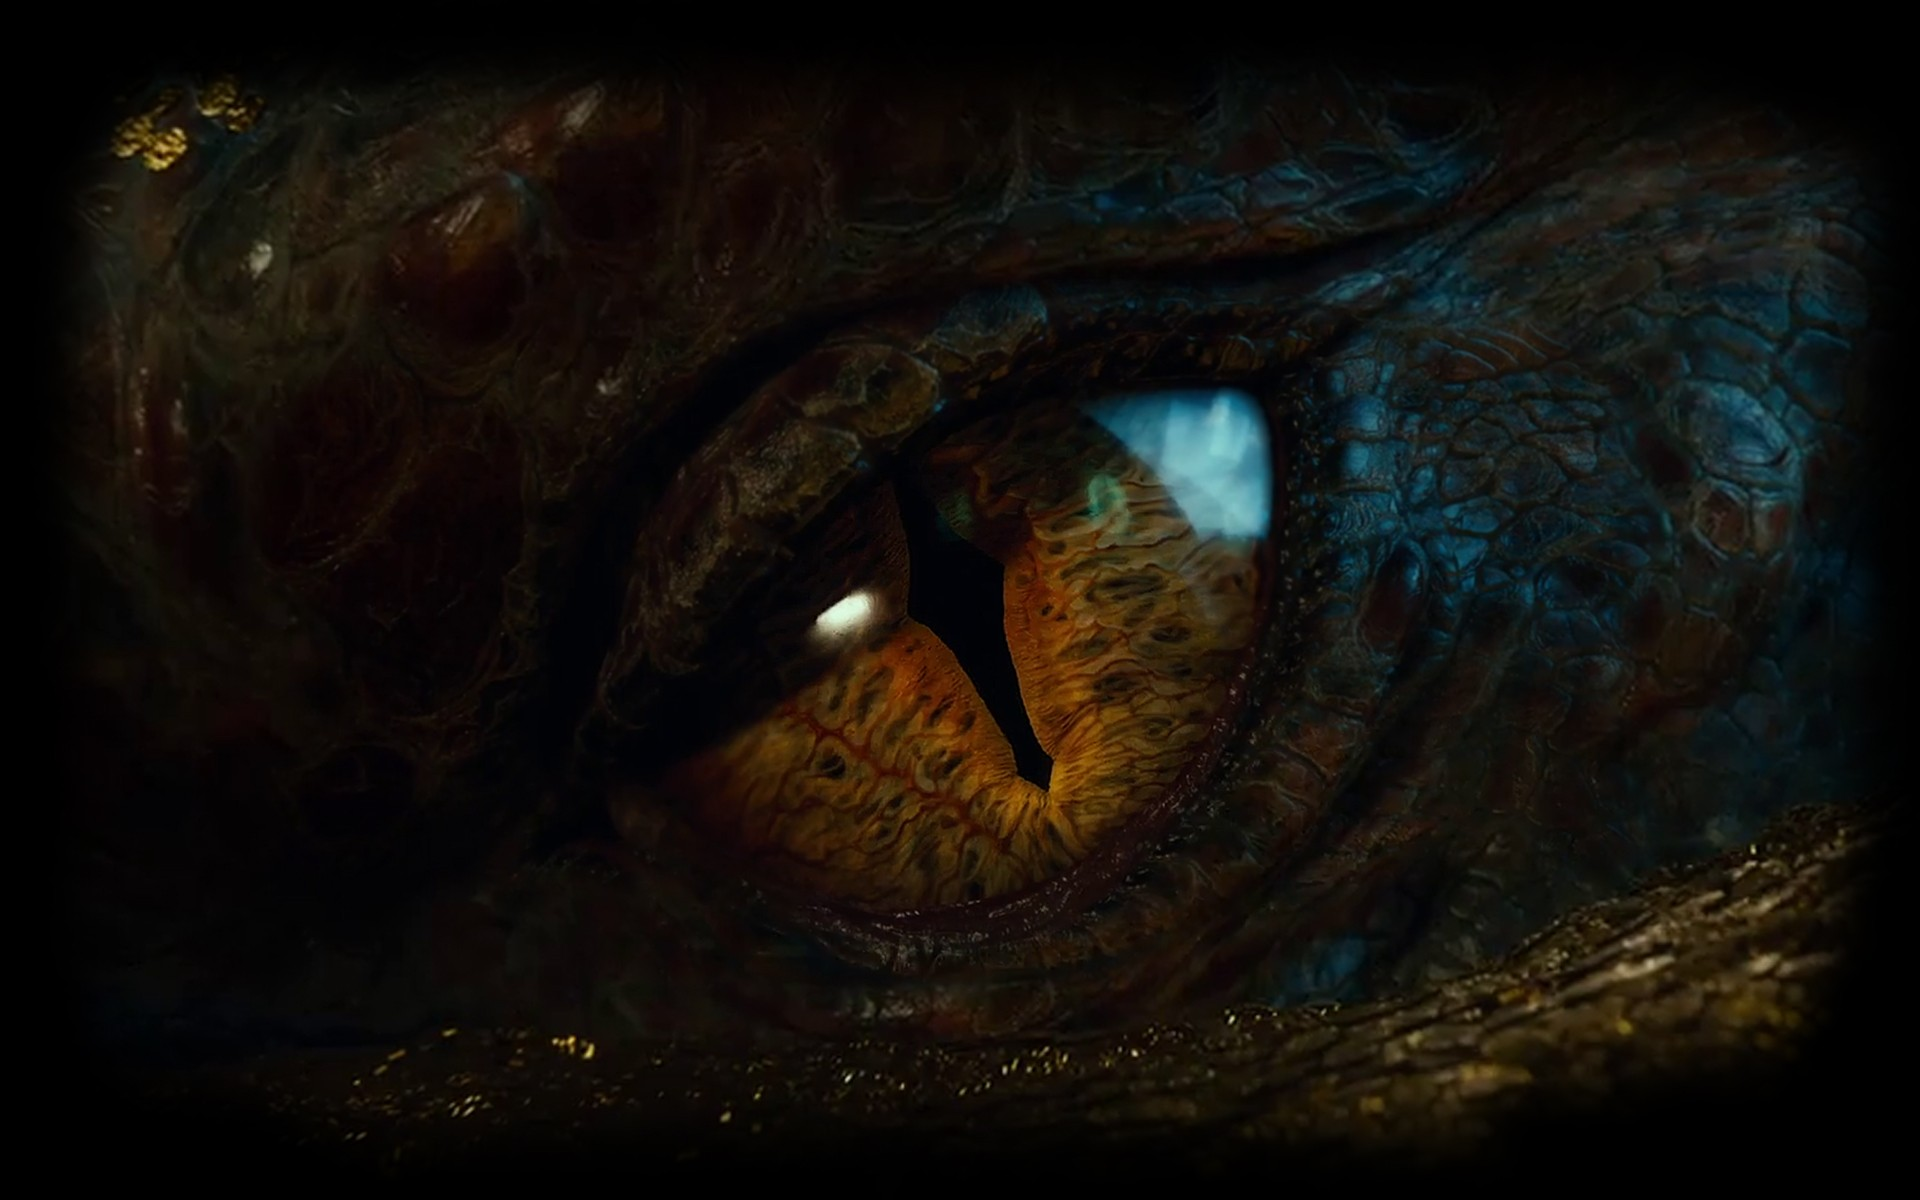 Hd wallpaper eye - Smaug The Hobbit An Unexpected Journey Wallpaper